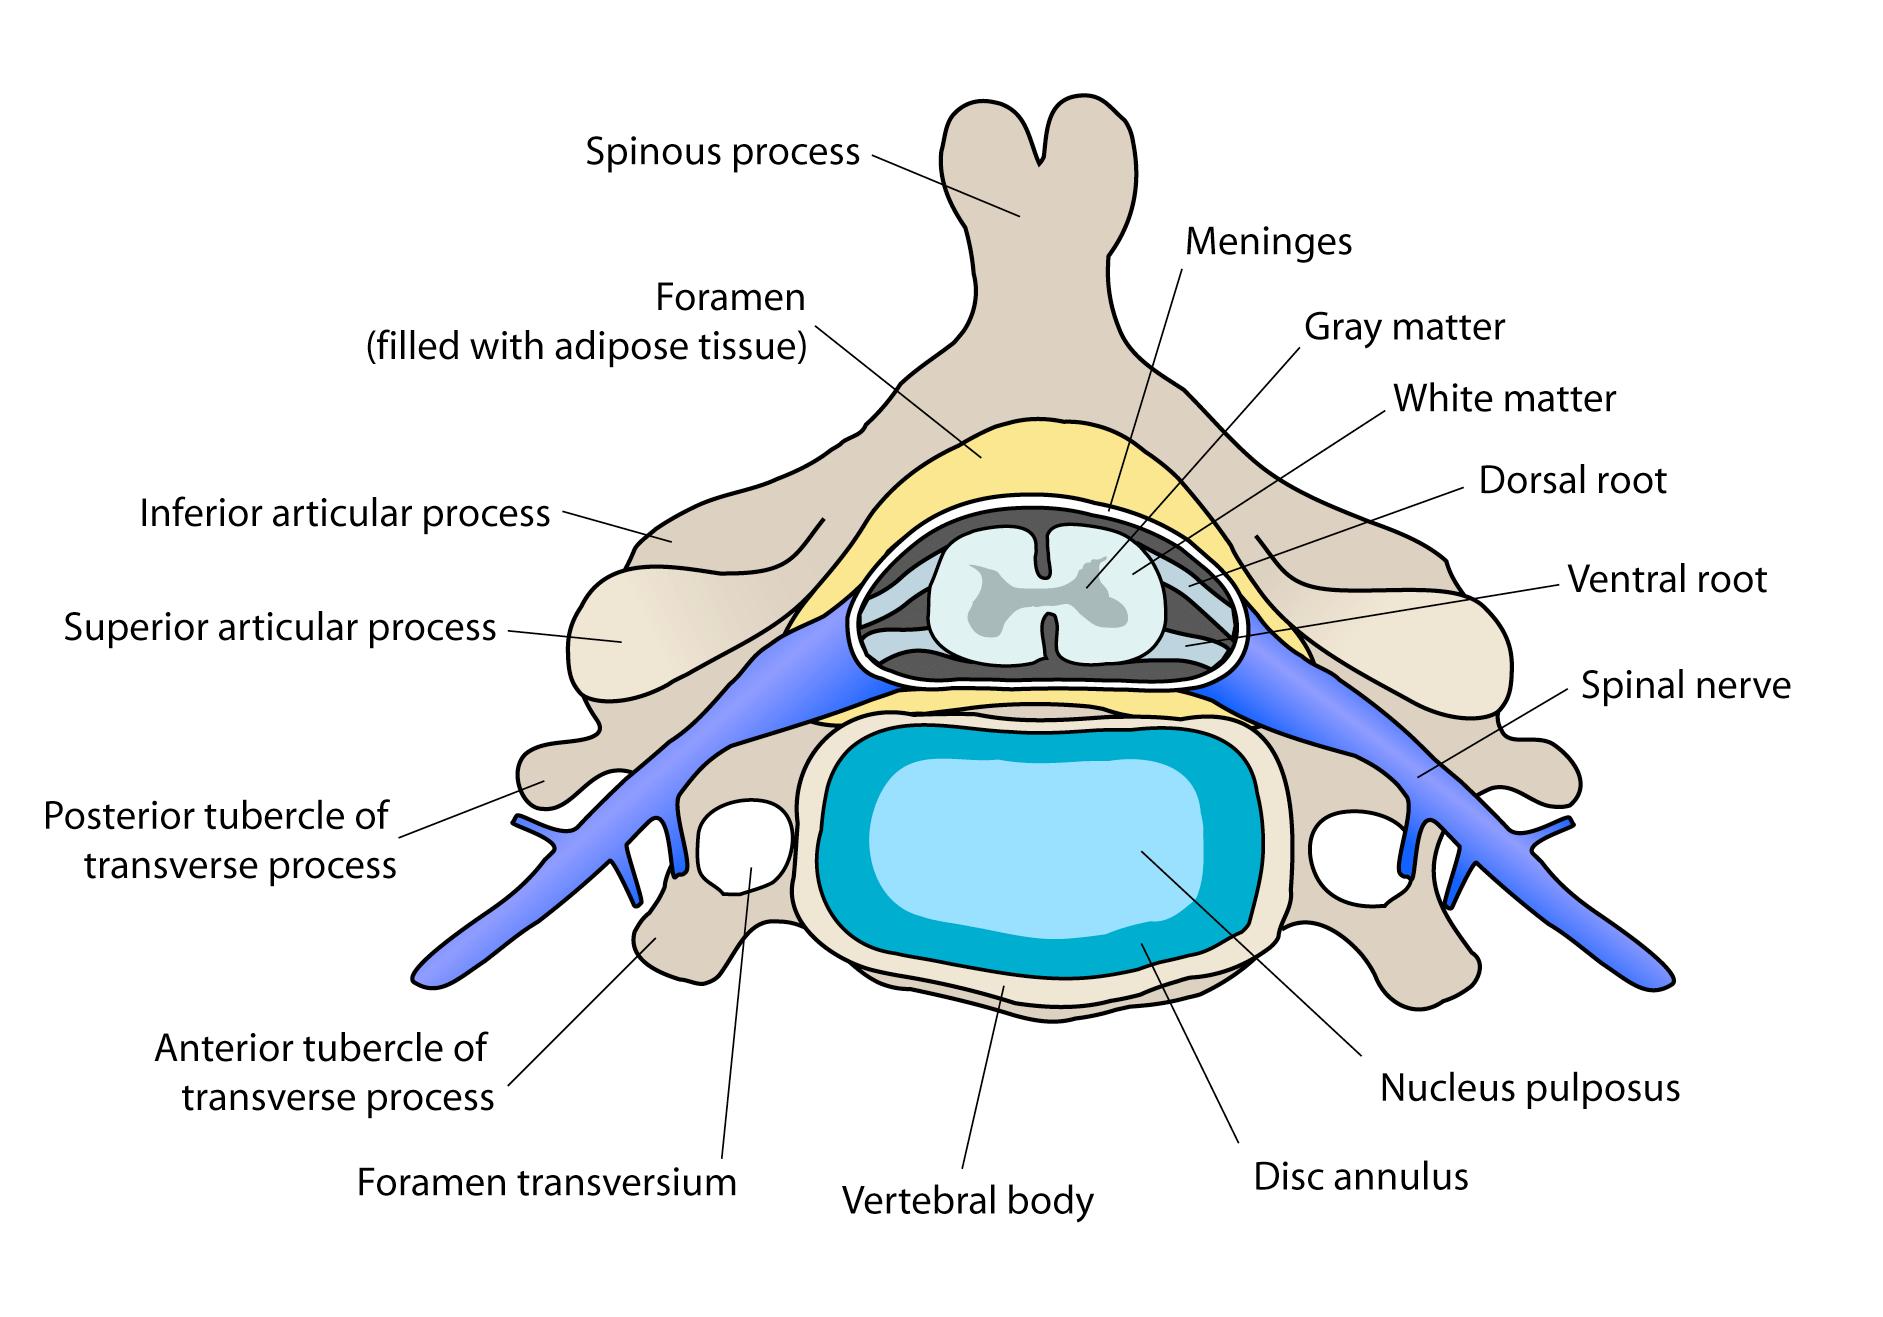 cervical vertebrae diagram 1998 yamaha golf cart wiring file vertebra english png wikimedia commons